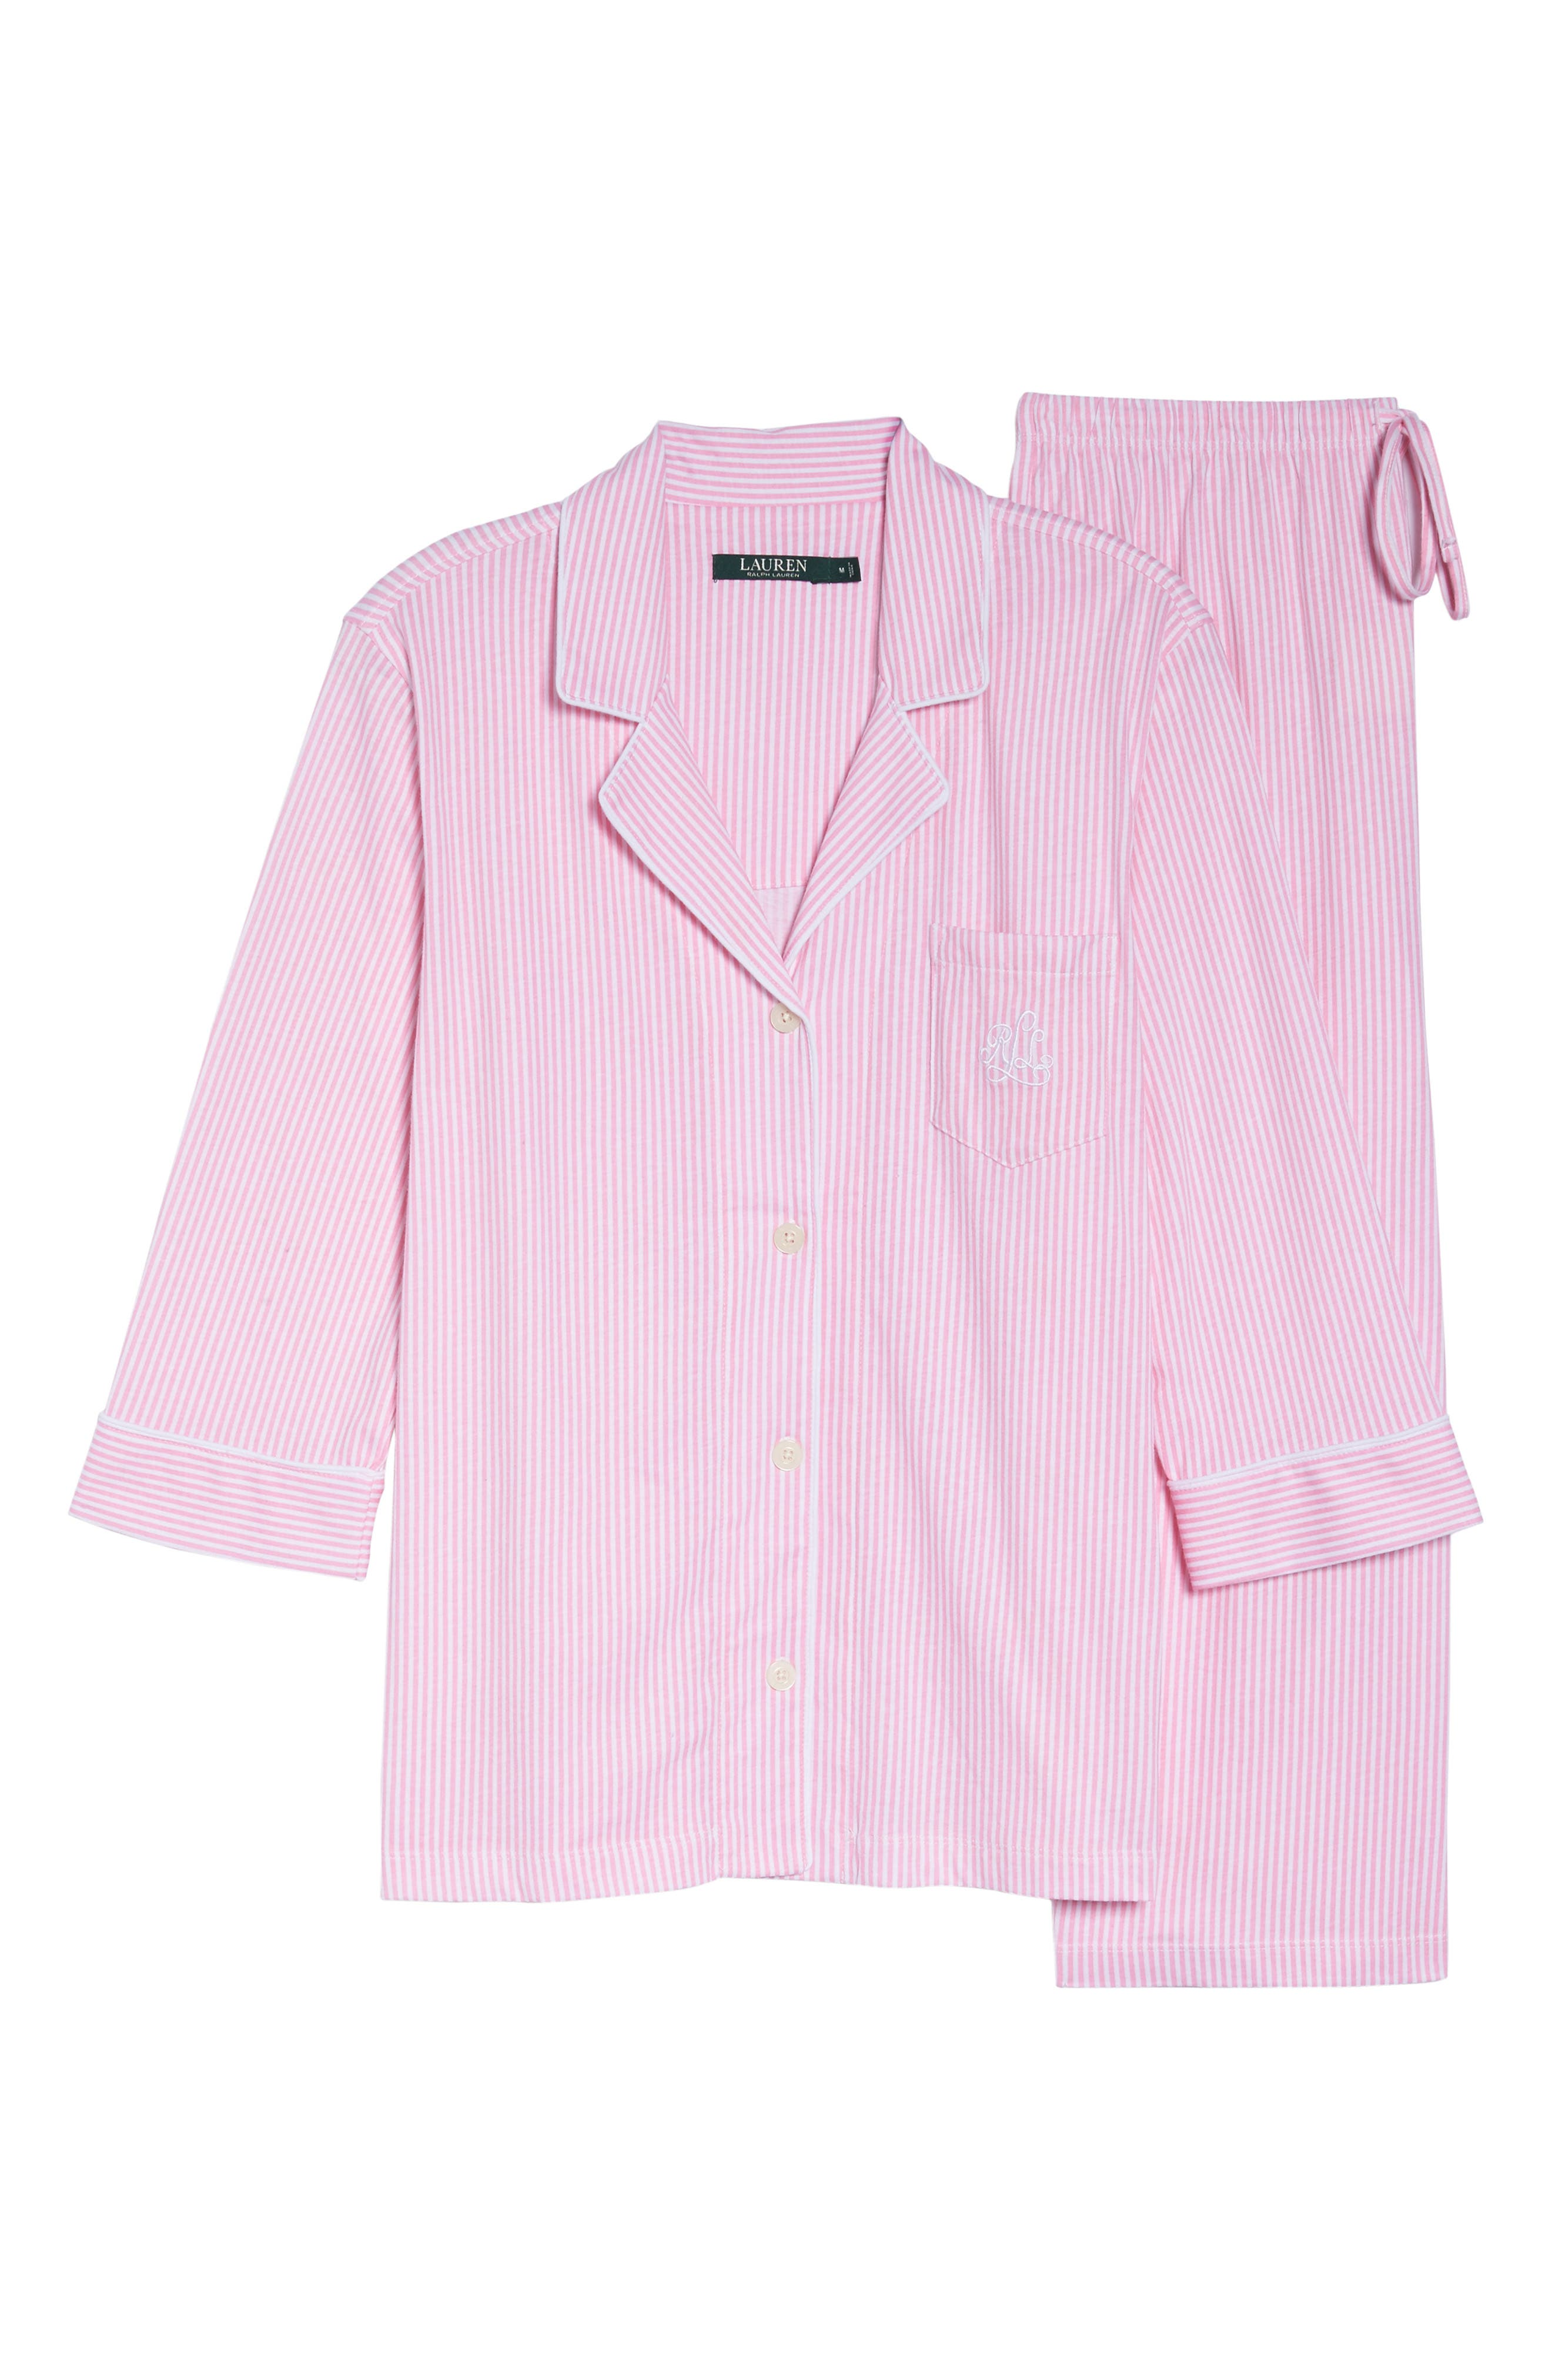 Knit Crop Pajamas,                             Alternate thumbnail 6, color,                             Lagoon Pink/ White Stripe